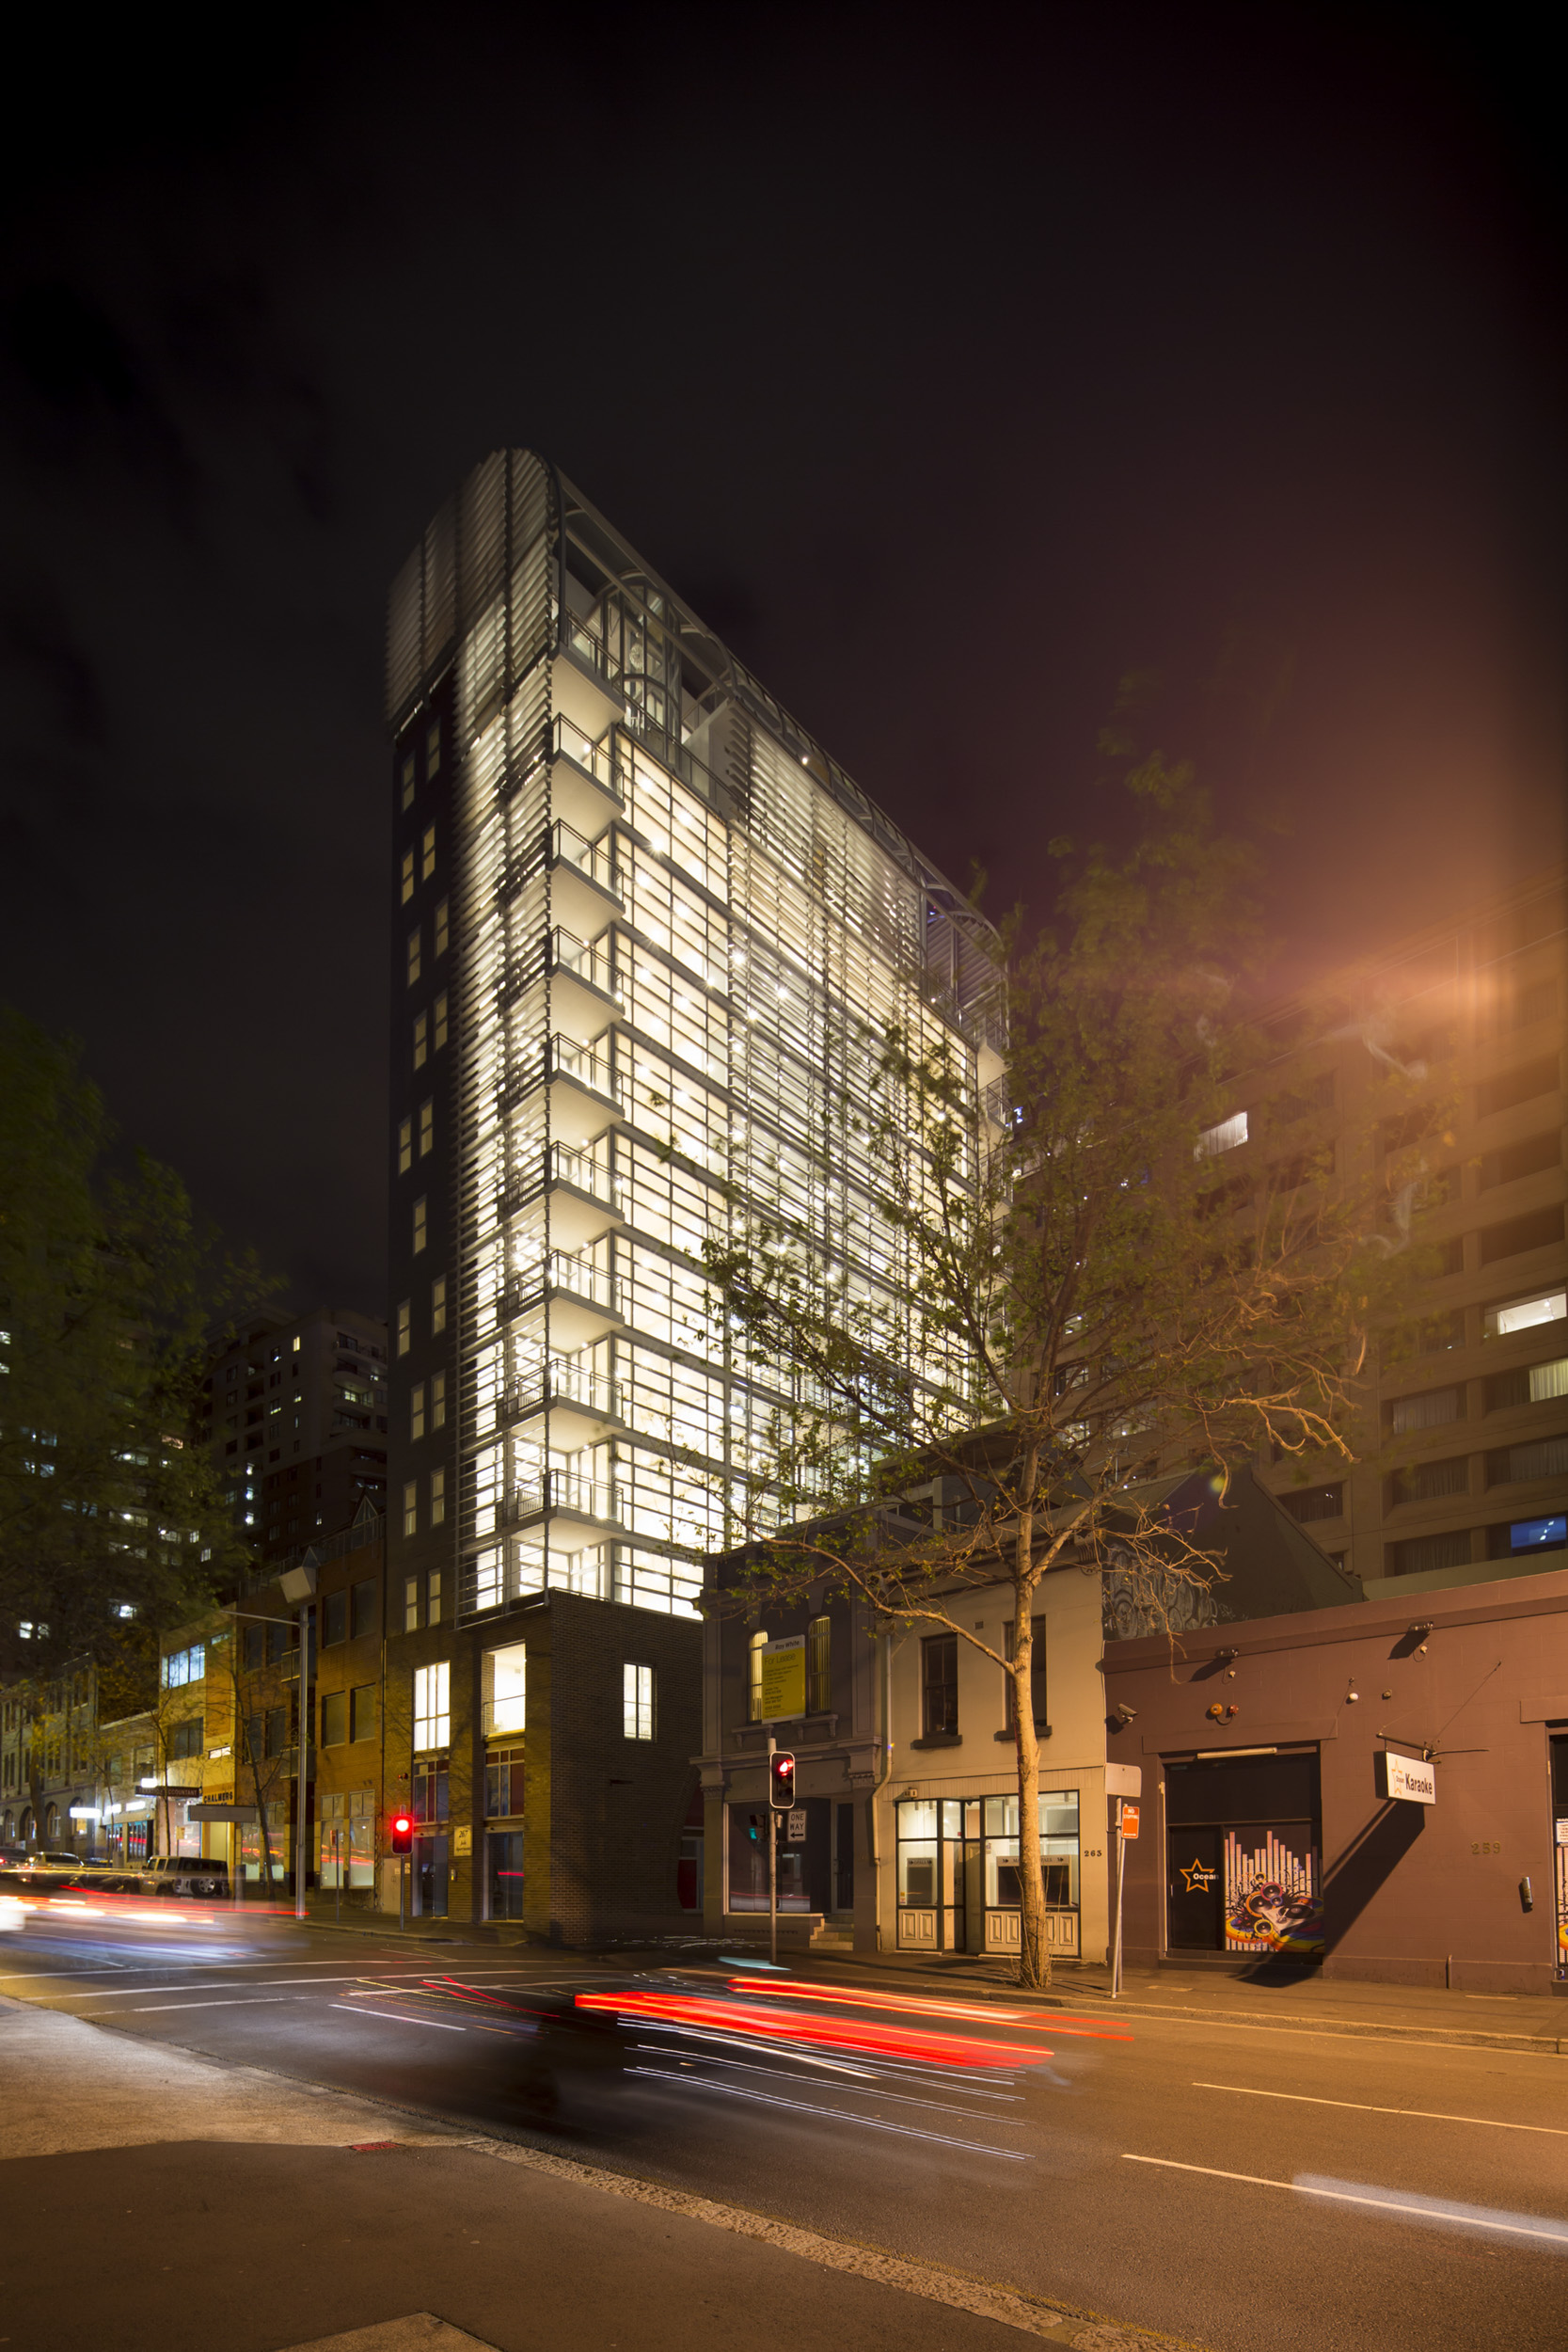 architecture_photography_sydney_australia_15.jpg